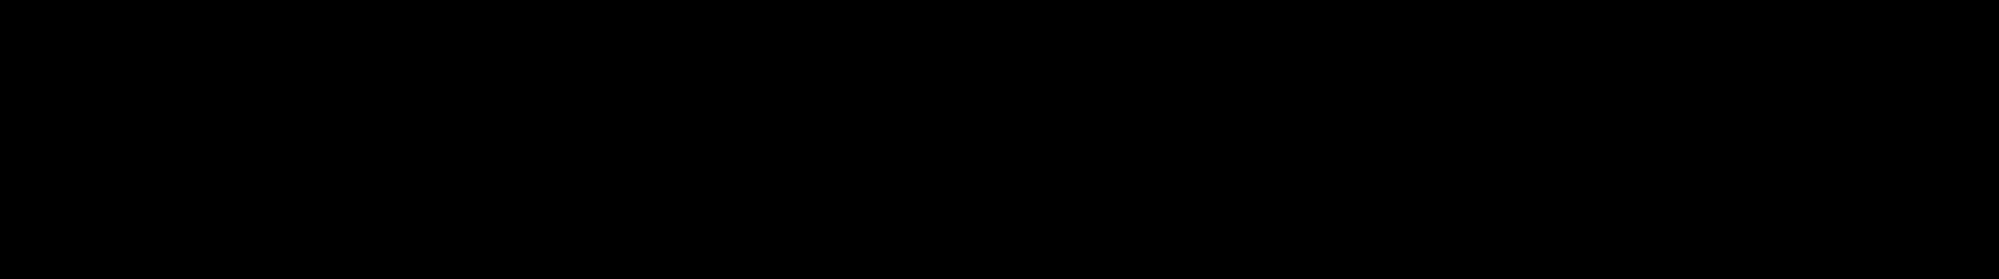 image31.png